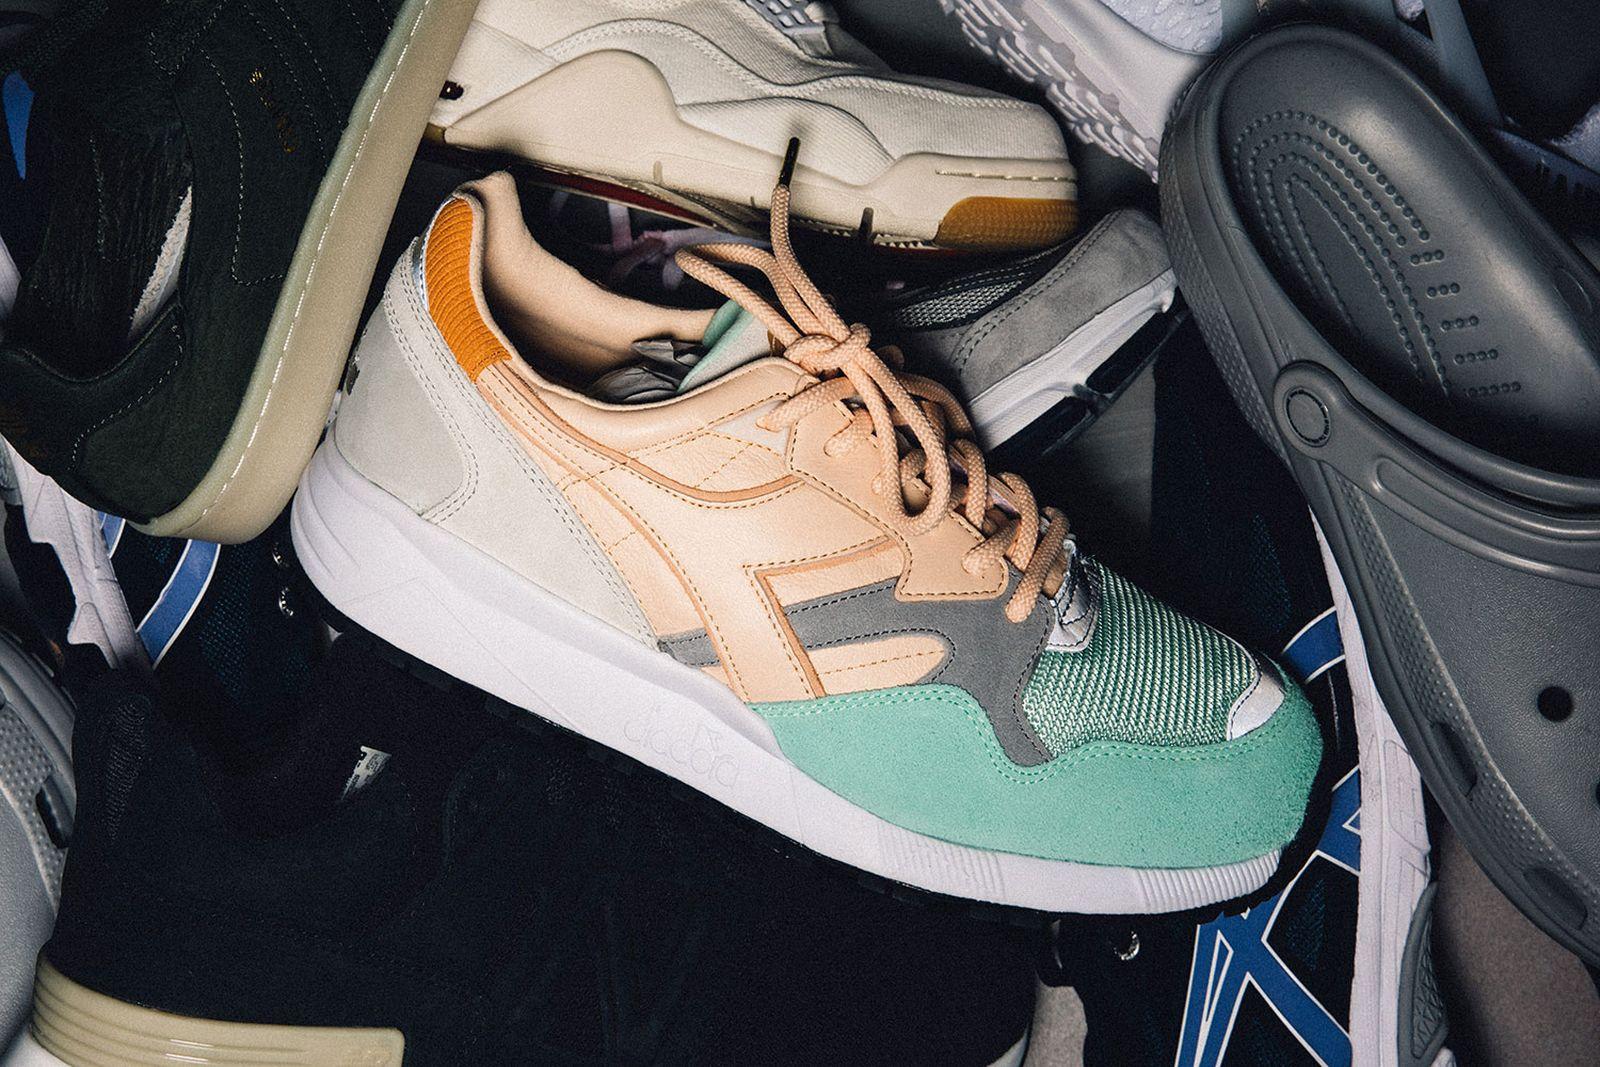 jeff top 10 sneakers 2018 best of 2018 staff lists